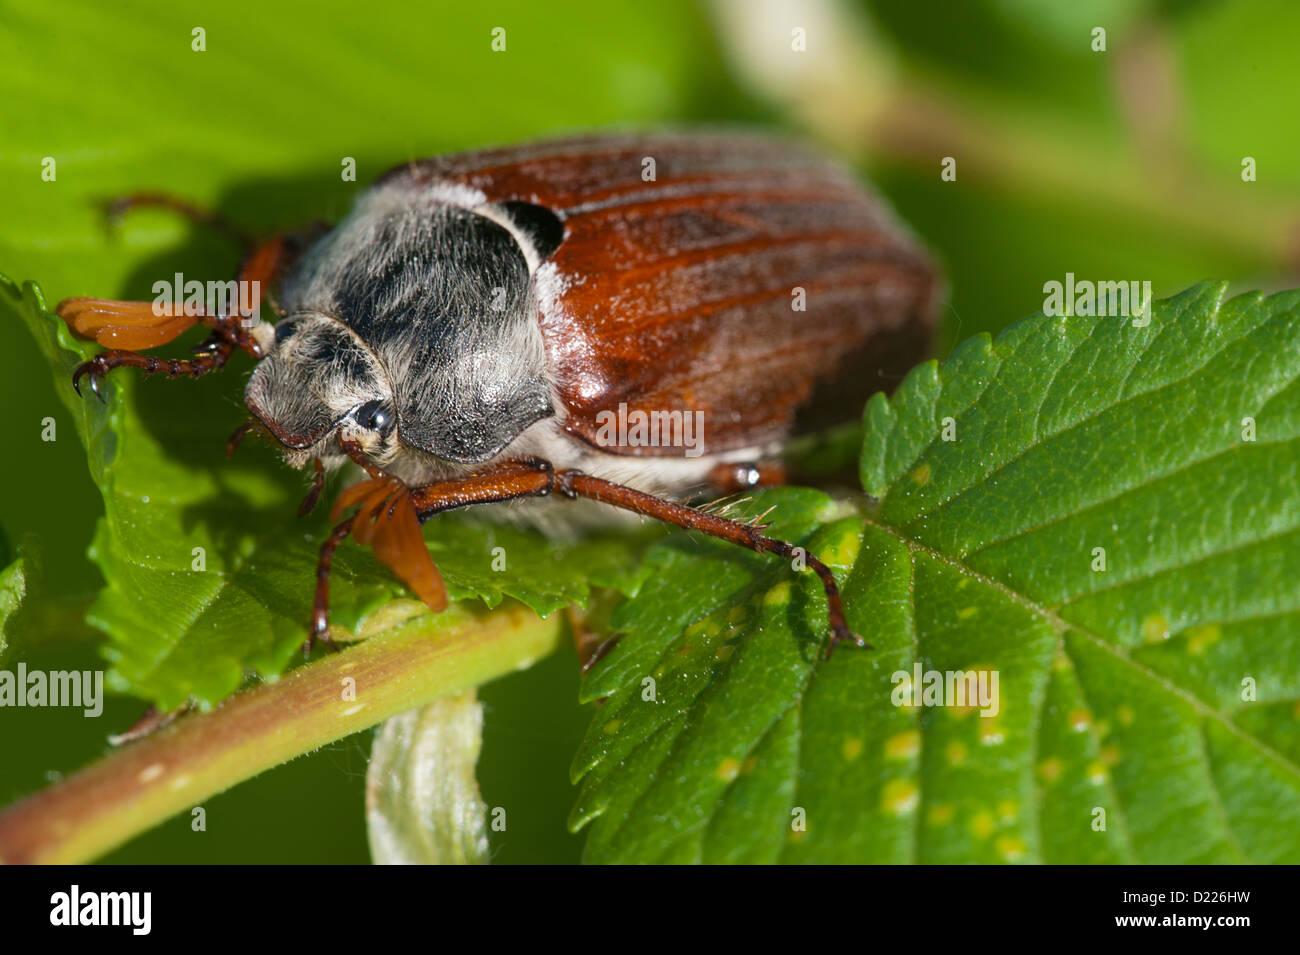 Maikaefer (Melolontha melolontha) Cockchafer, Maybug • Baden-Wuerttemberg, Deutschland Stock Photo